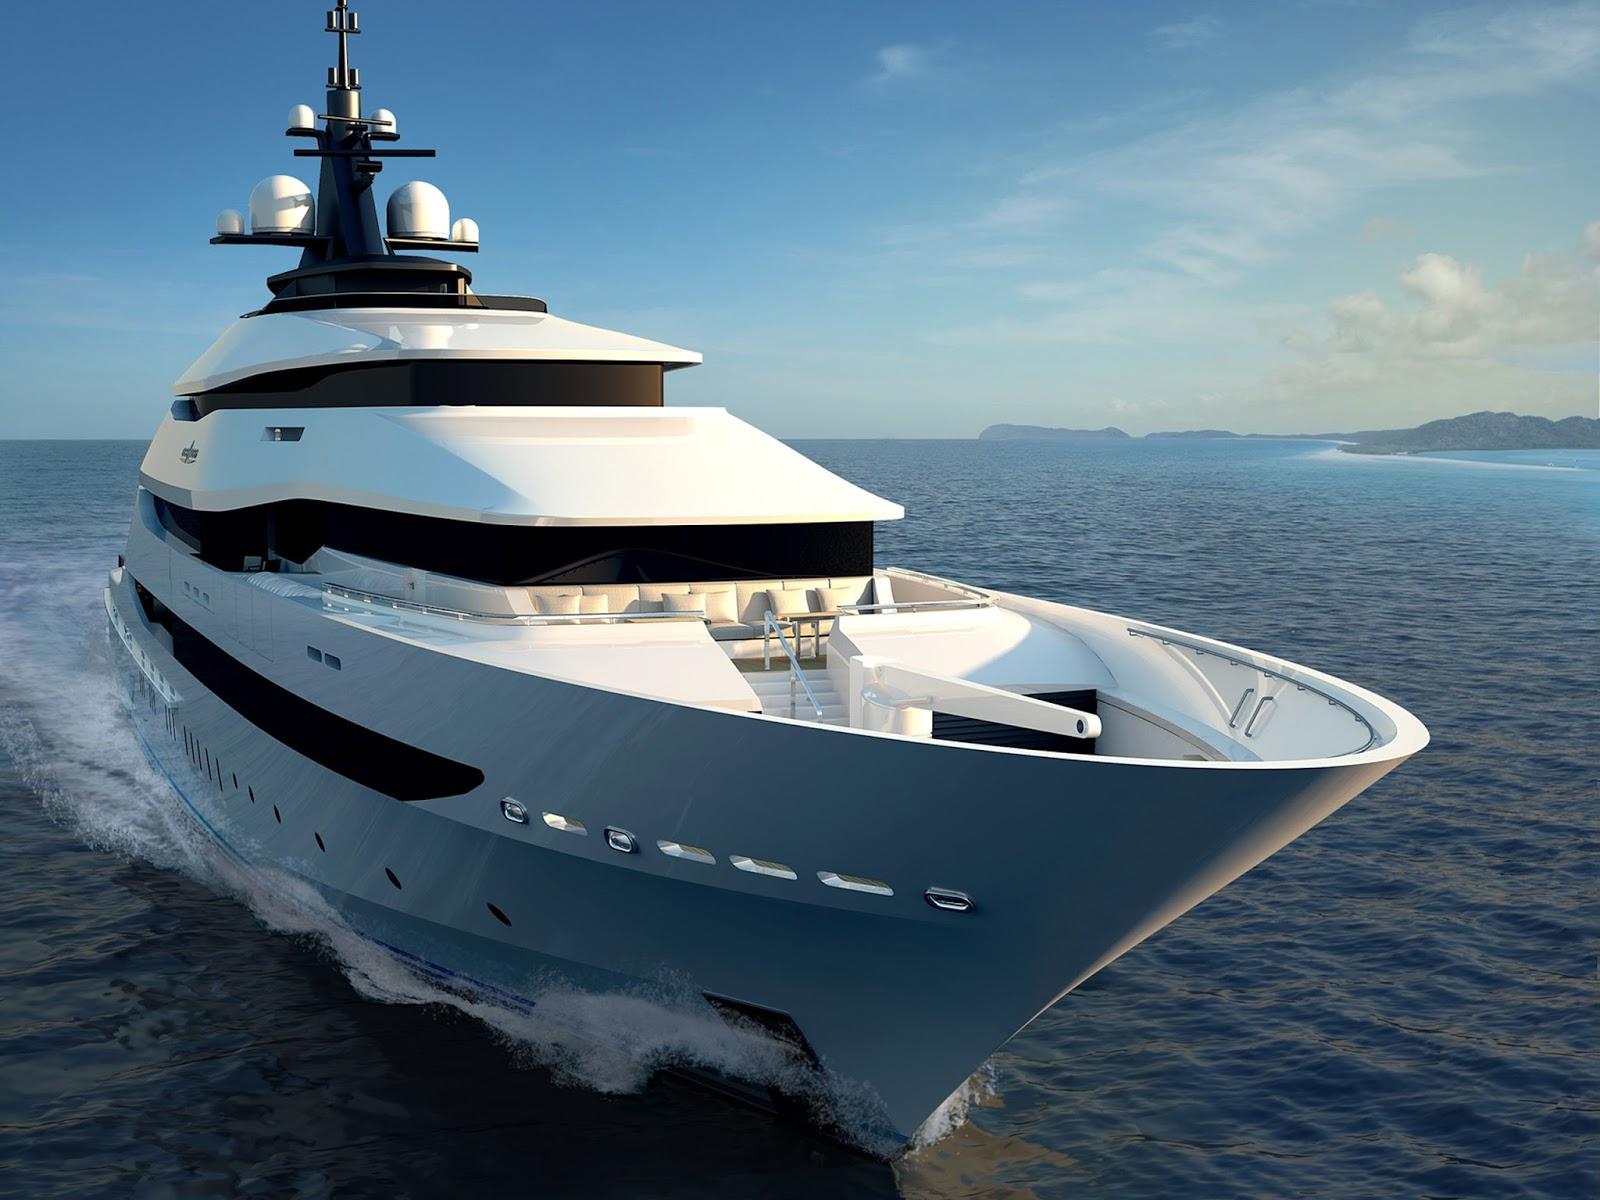 luxury super yacht wallpaper - photo #1